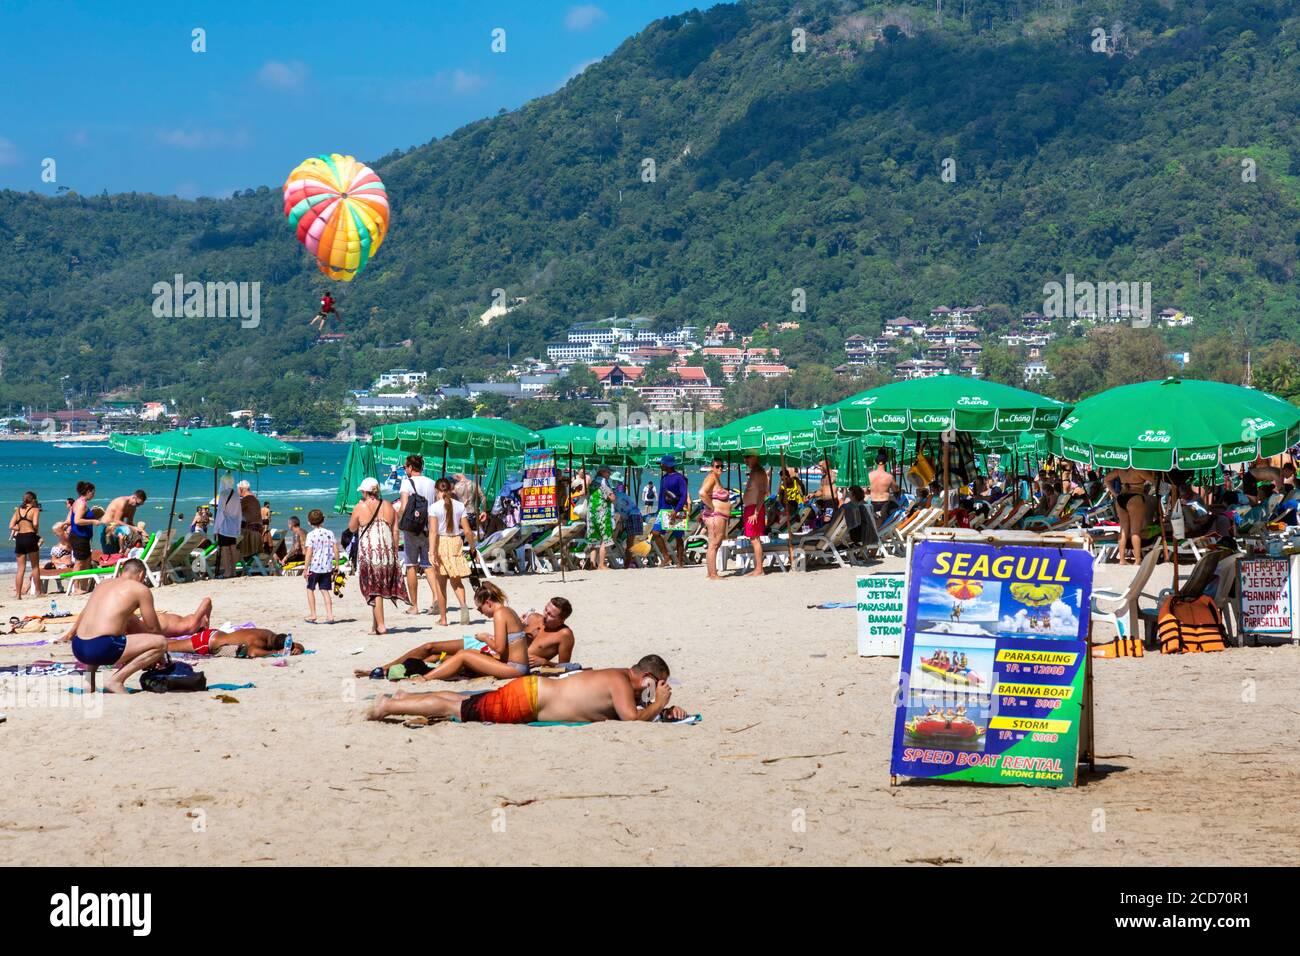 Überfüllter Strand in Patong, Phuket, Thailand Stockfoto